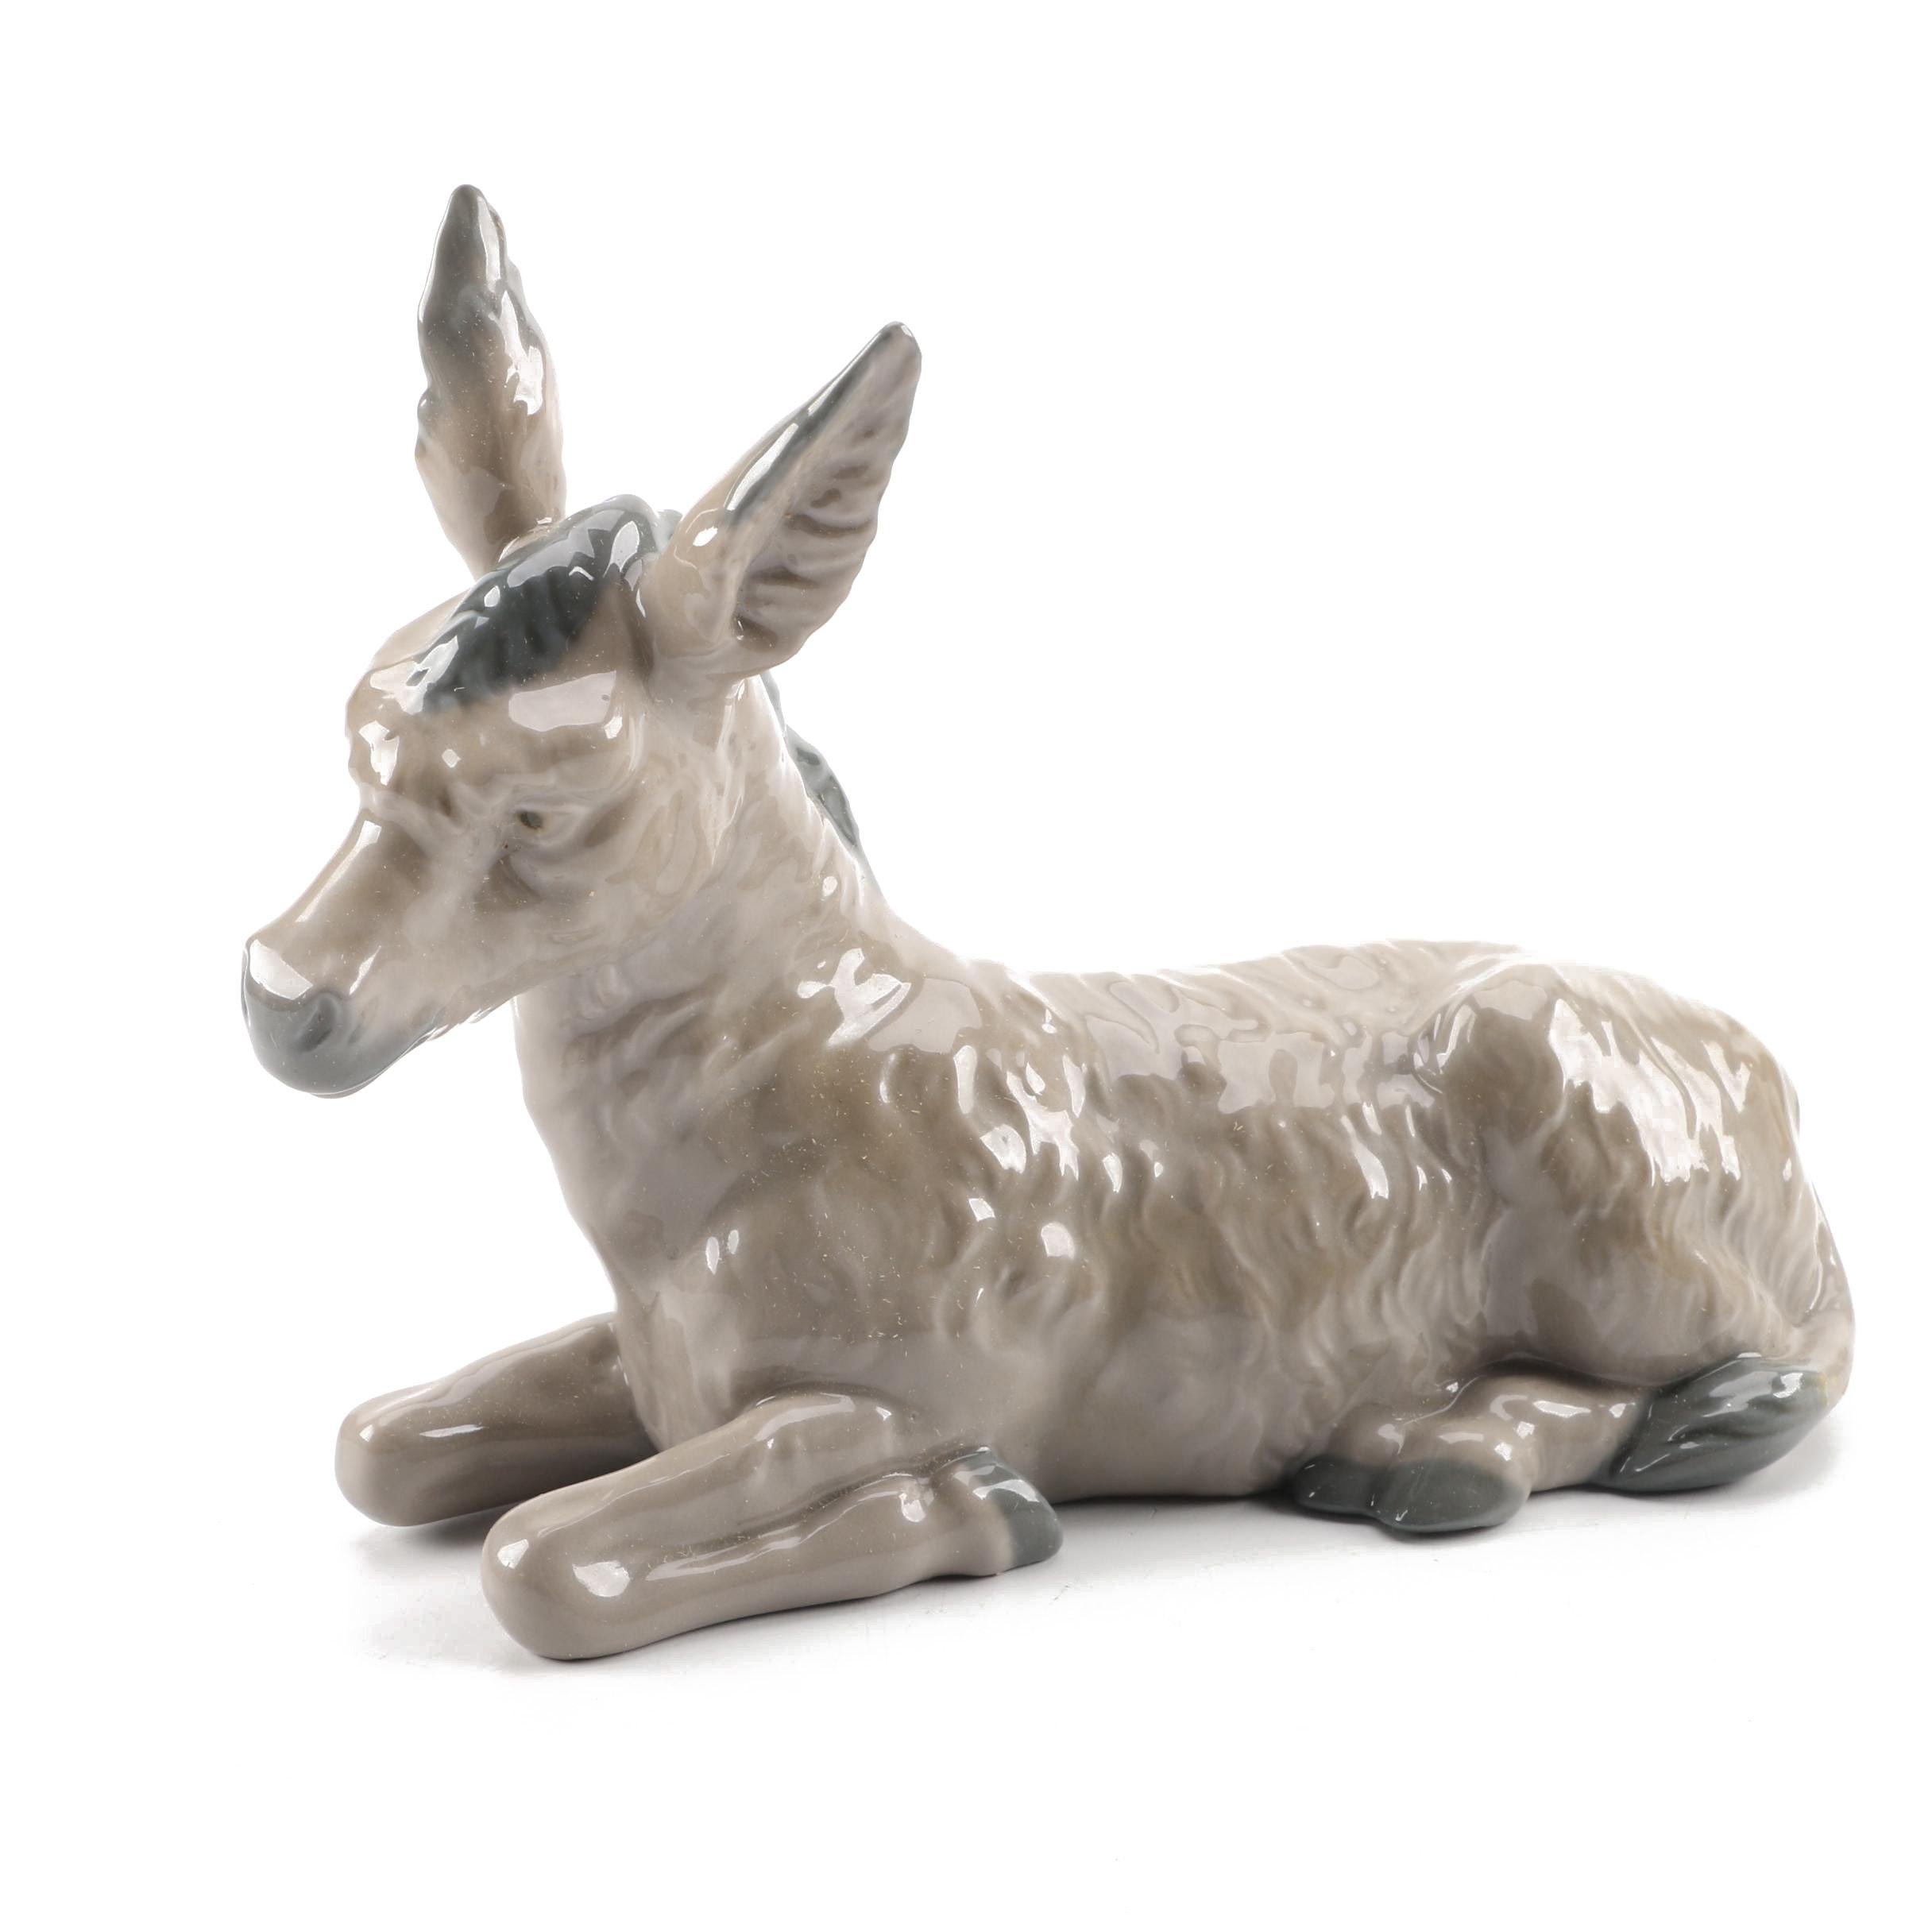 Vintage Nao by Lladro Donkey Figurine